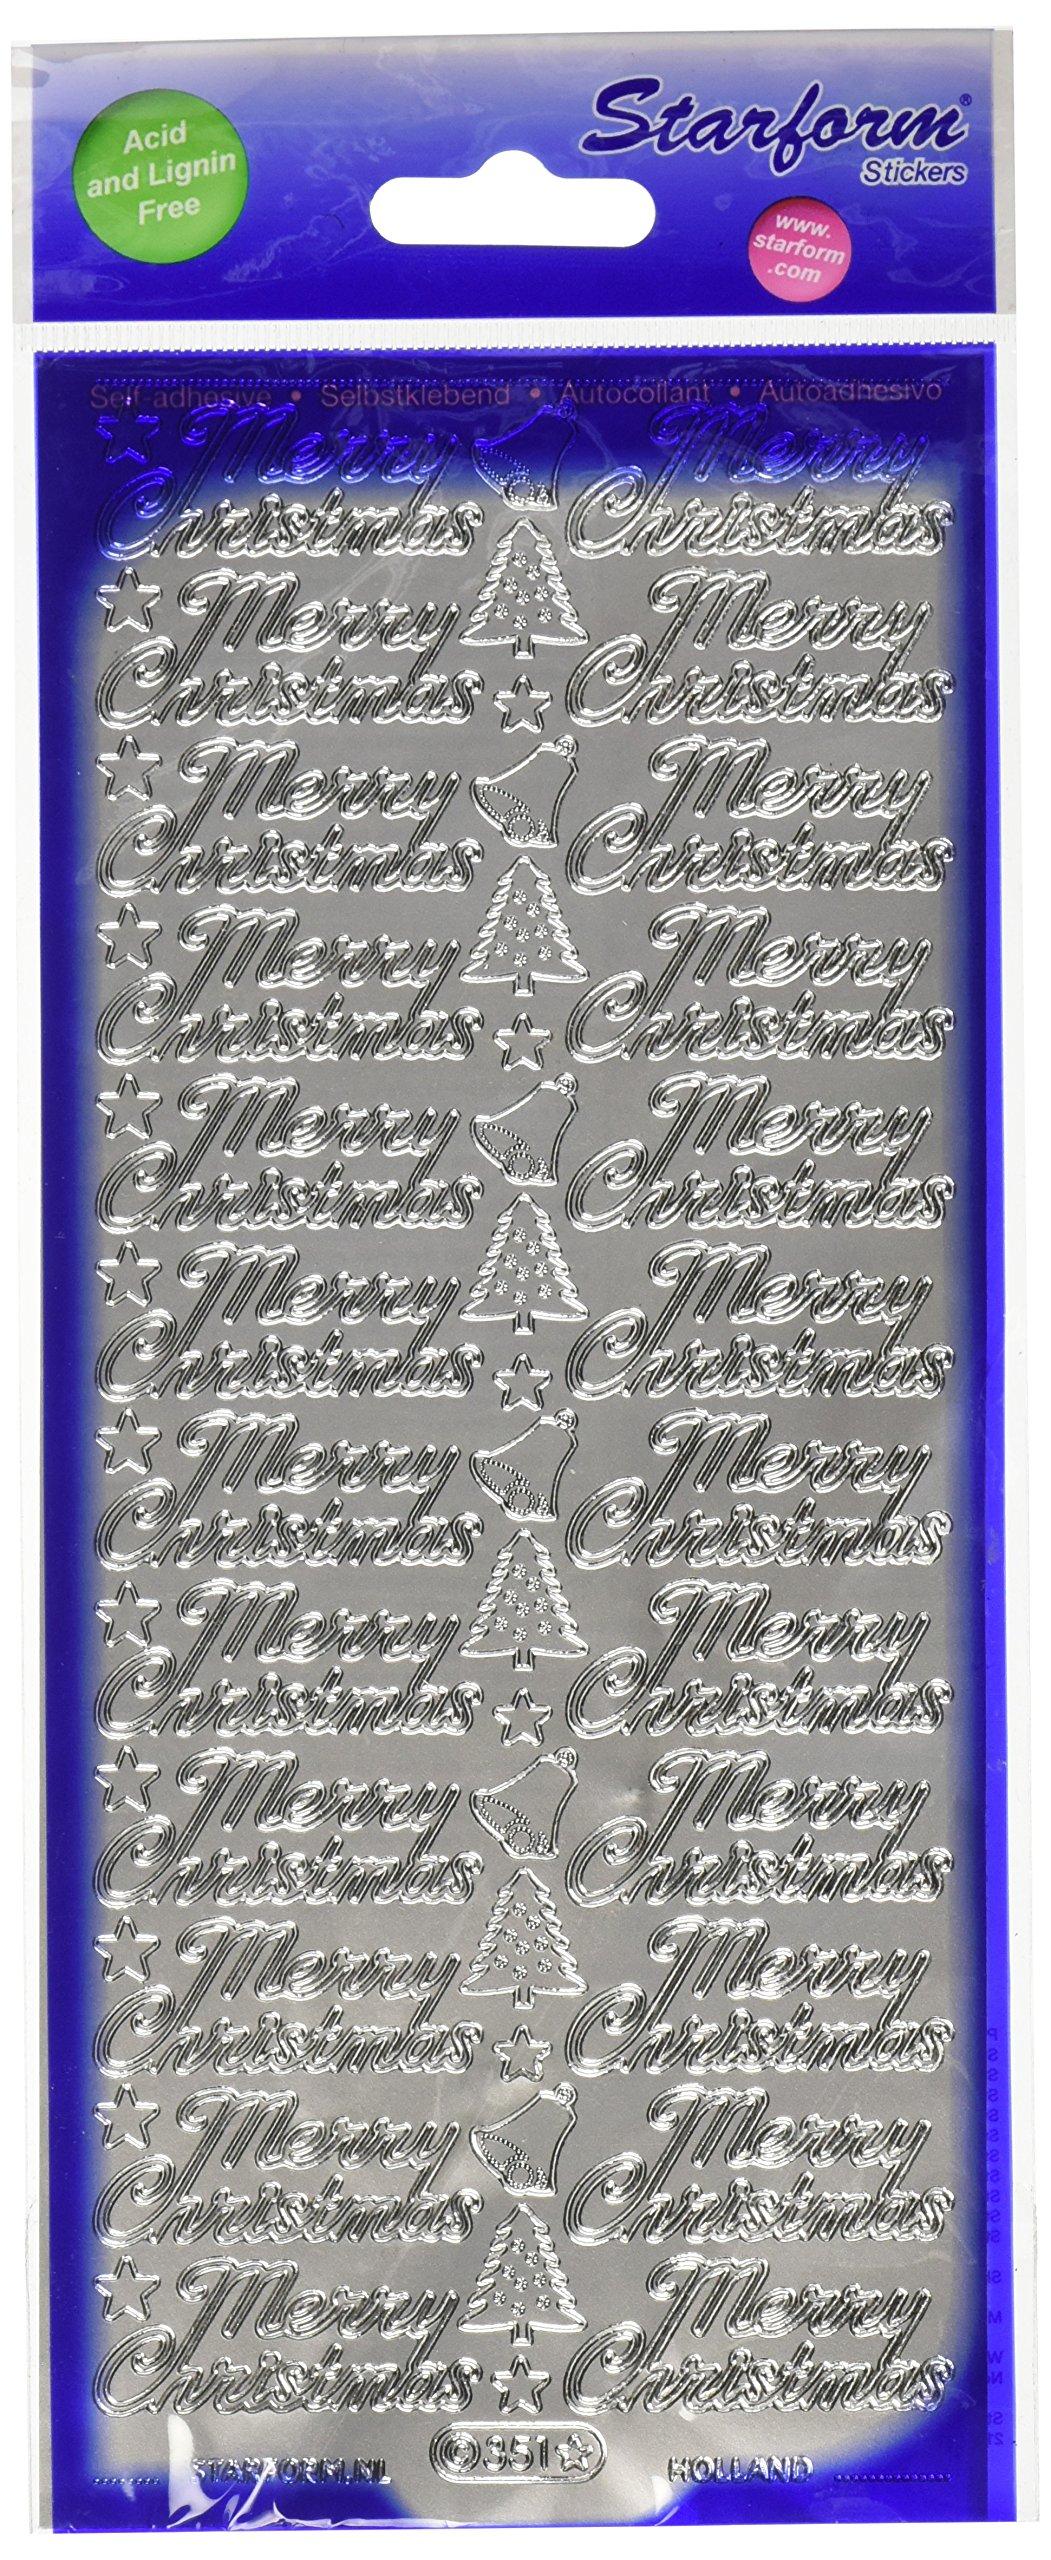 Starform Deco Stickers, Silver, Merry Christmas